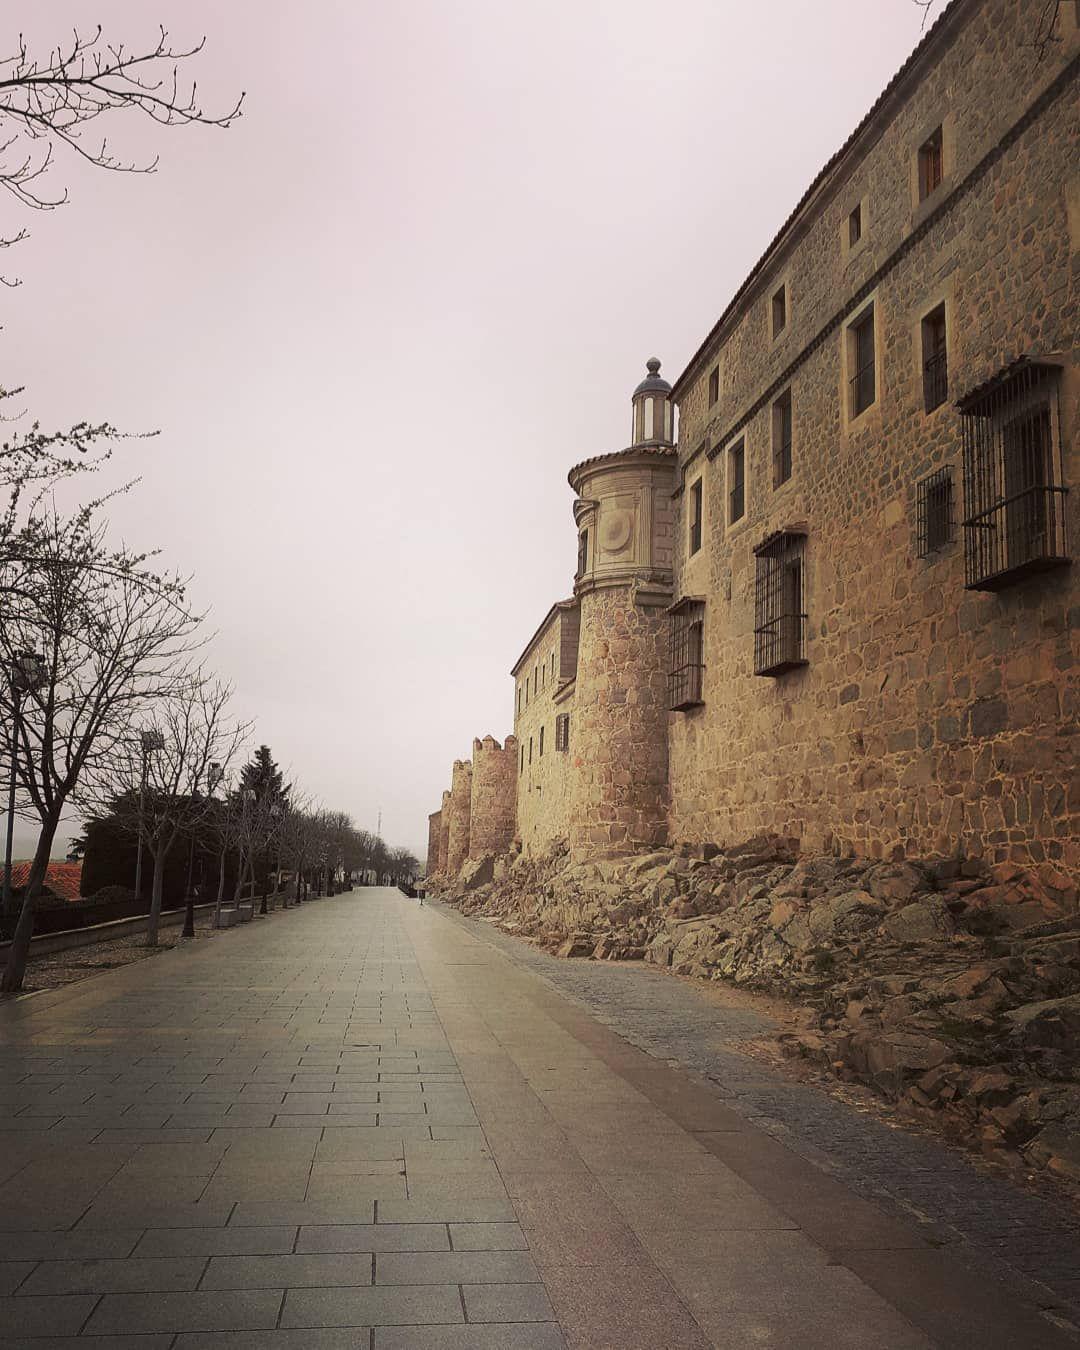 #avila #piedra #nublado #rosesky #stone #raining #lluviafina #plomo #cielorosa #medieval #road #camino